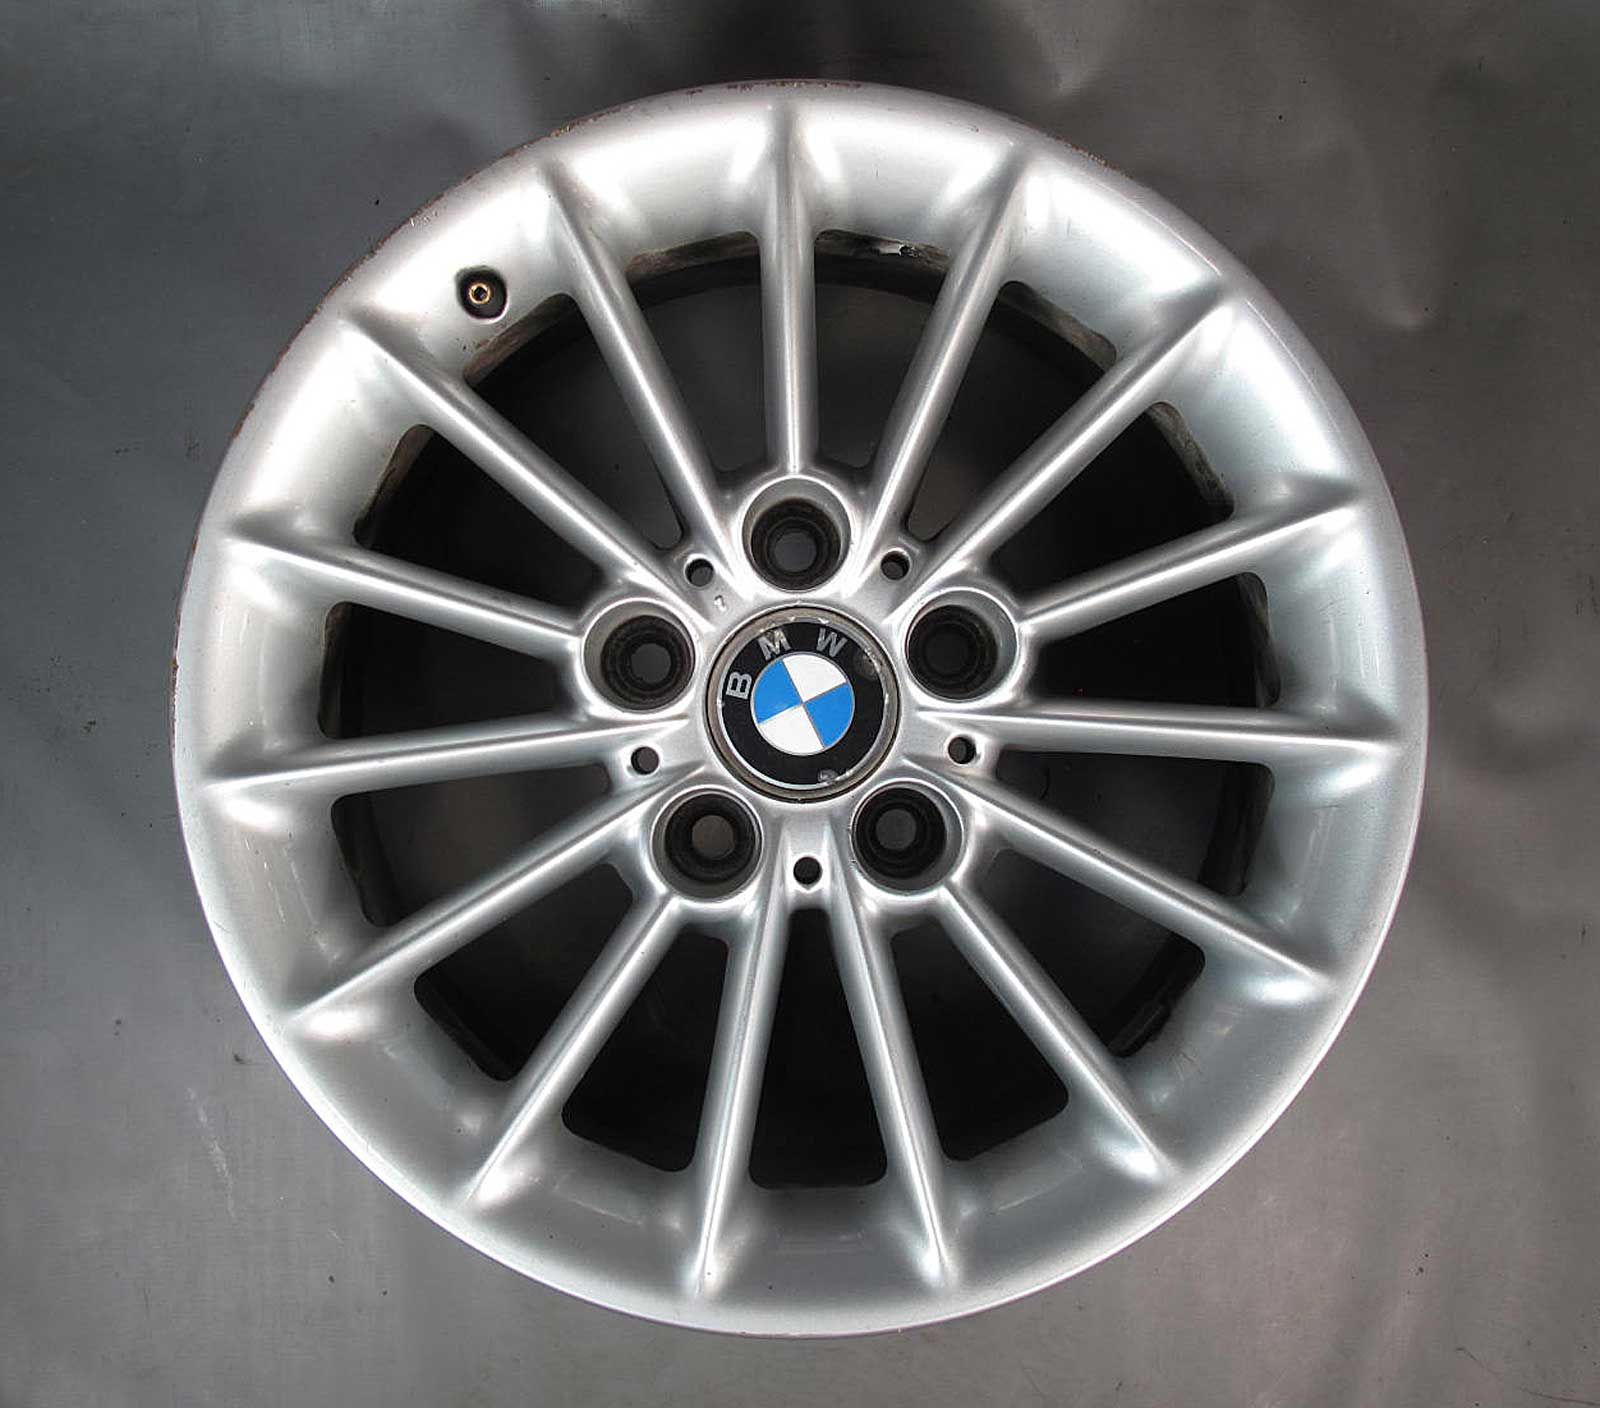 wheels rim bmw merchant styles com style m staggered mvc bekkers